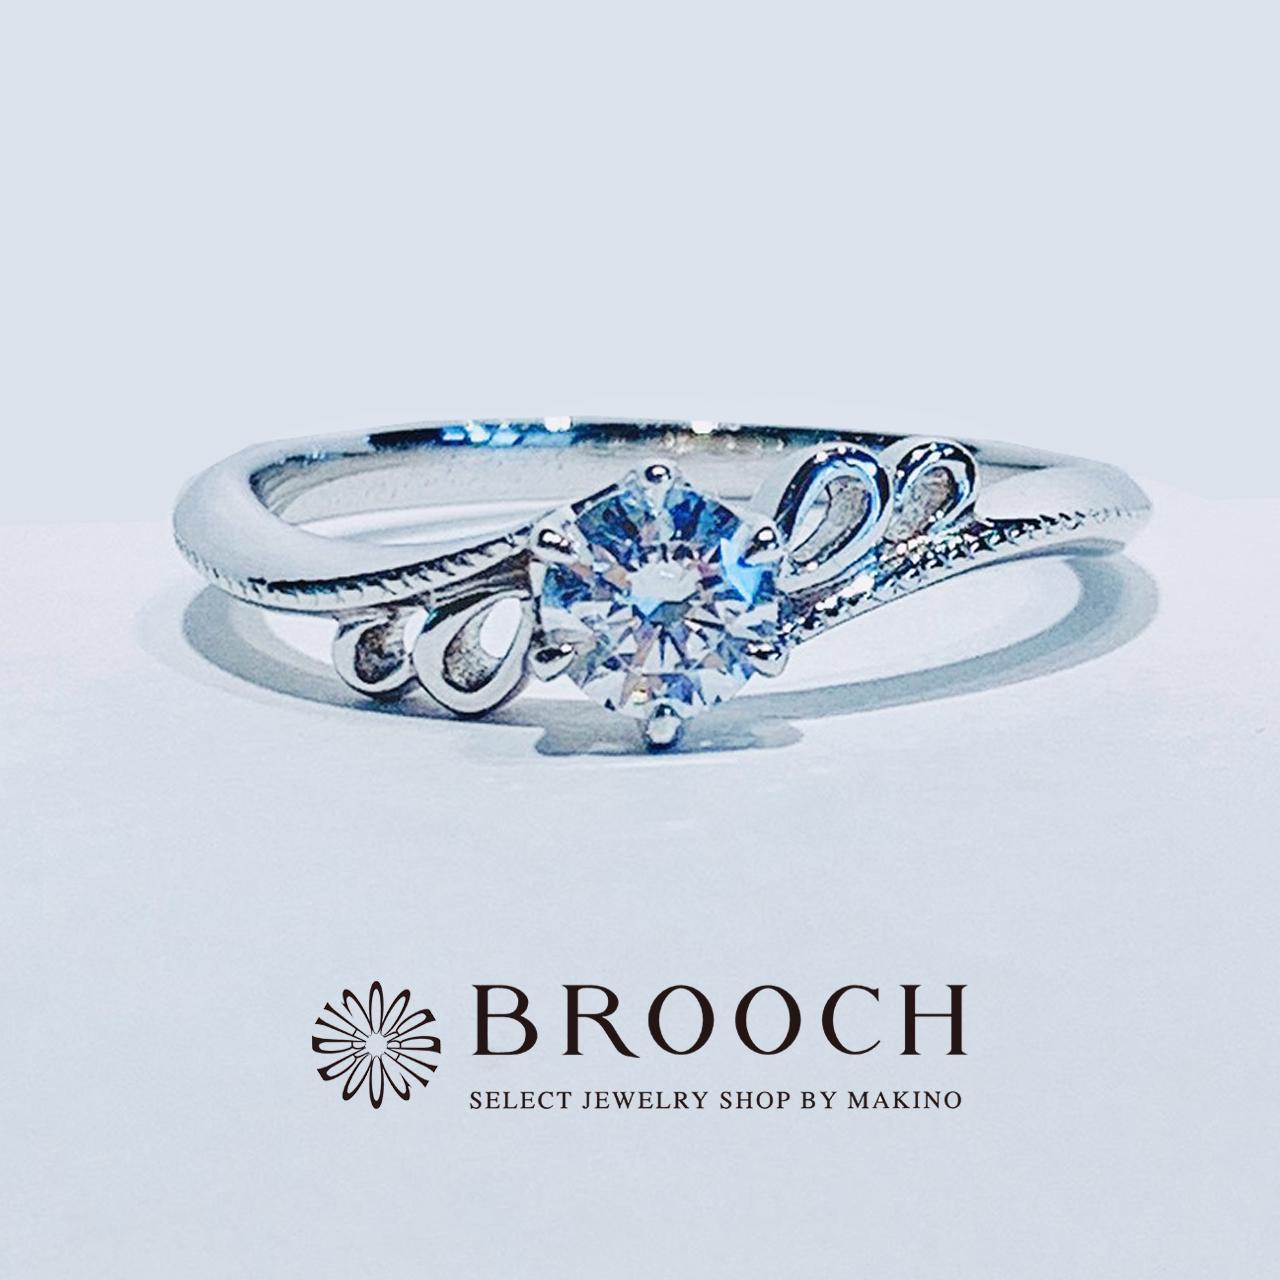 BROOCH 婚約指輪 エンゲージリング かわいい ドレープ風デザイン